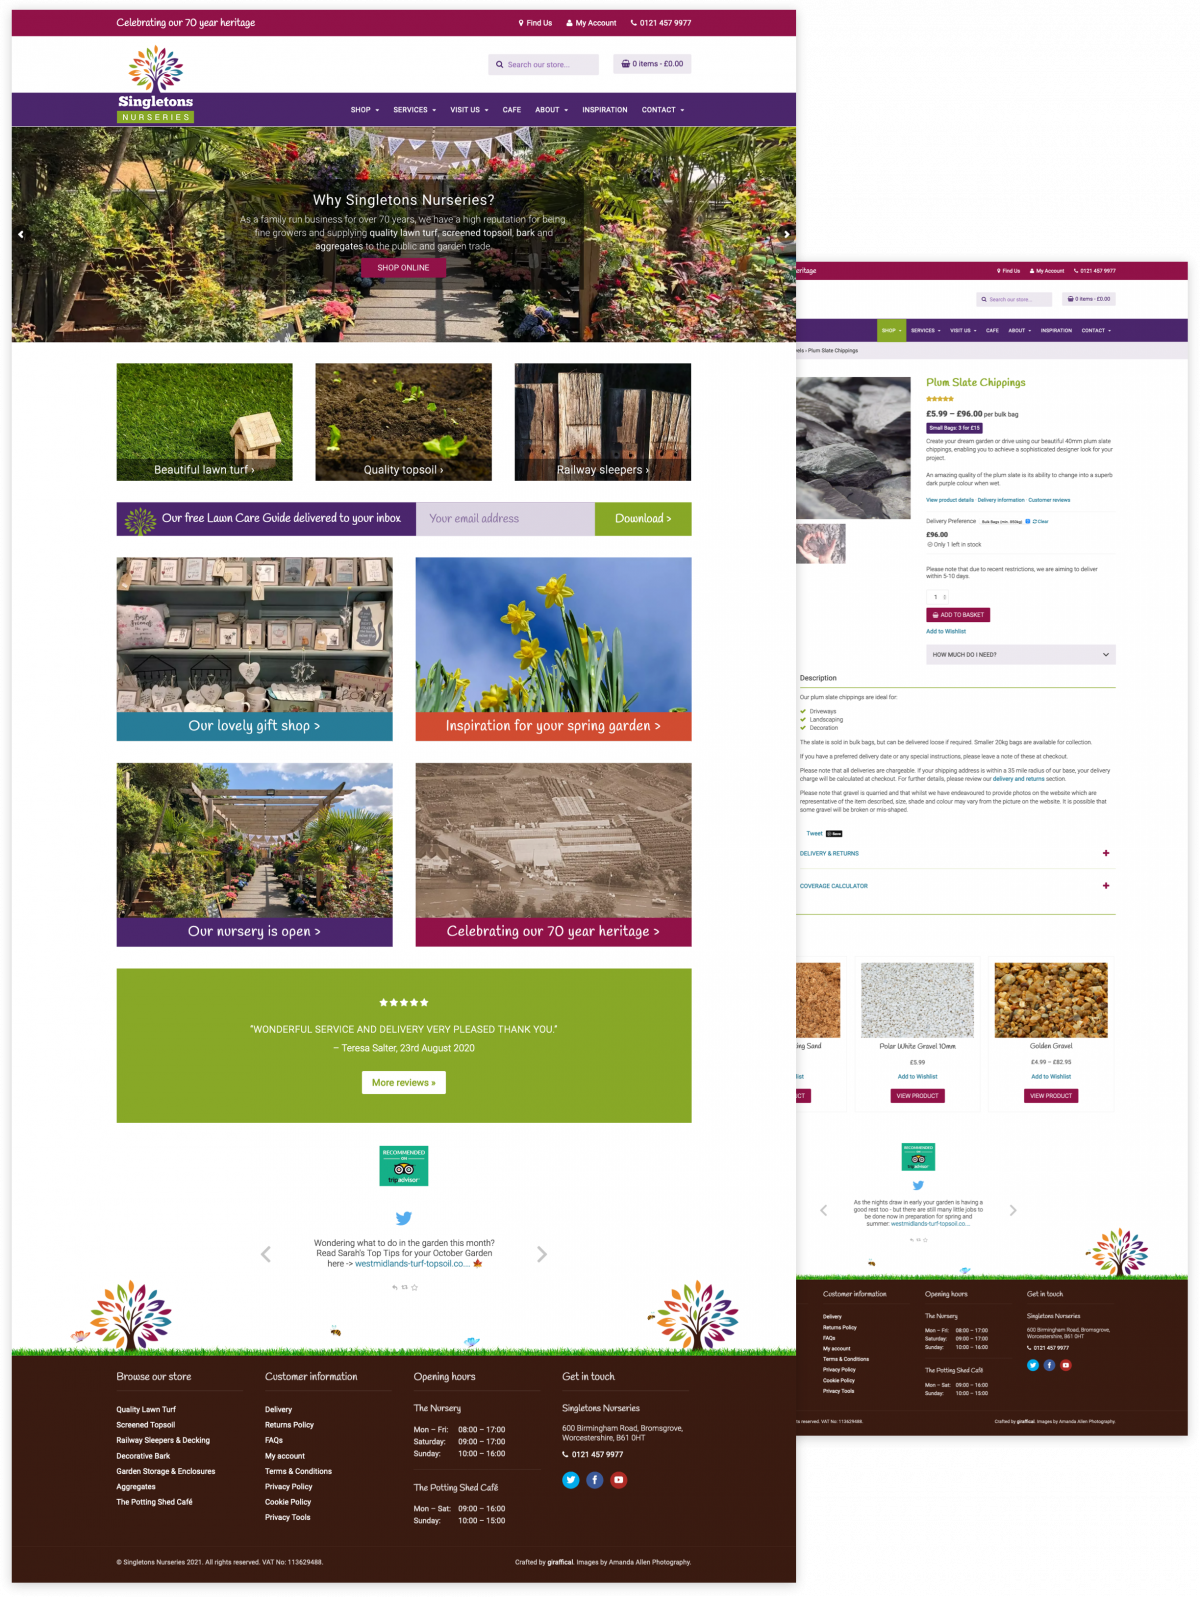 Garden Centre Website Design - Singletons Nurseries